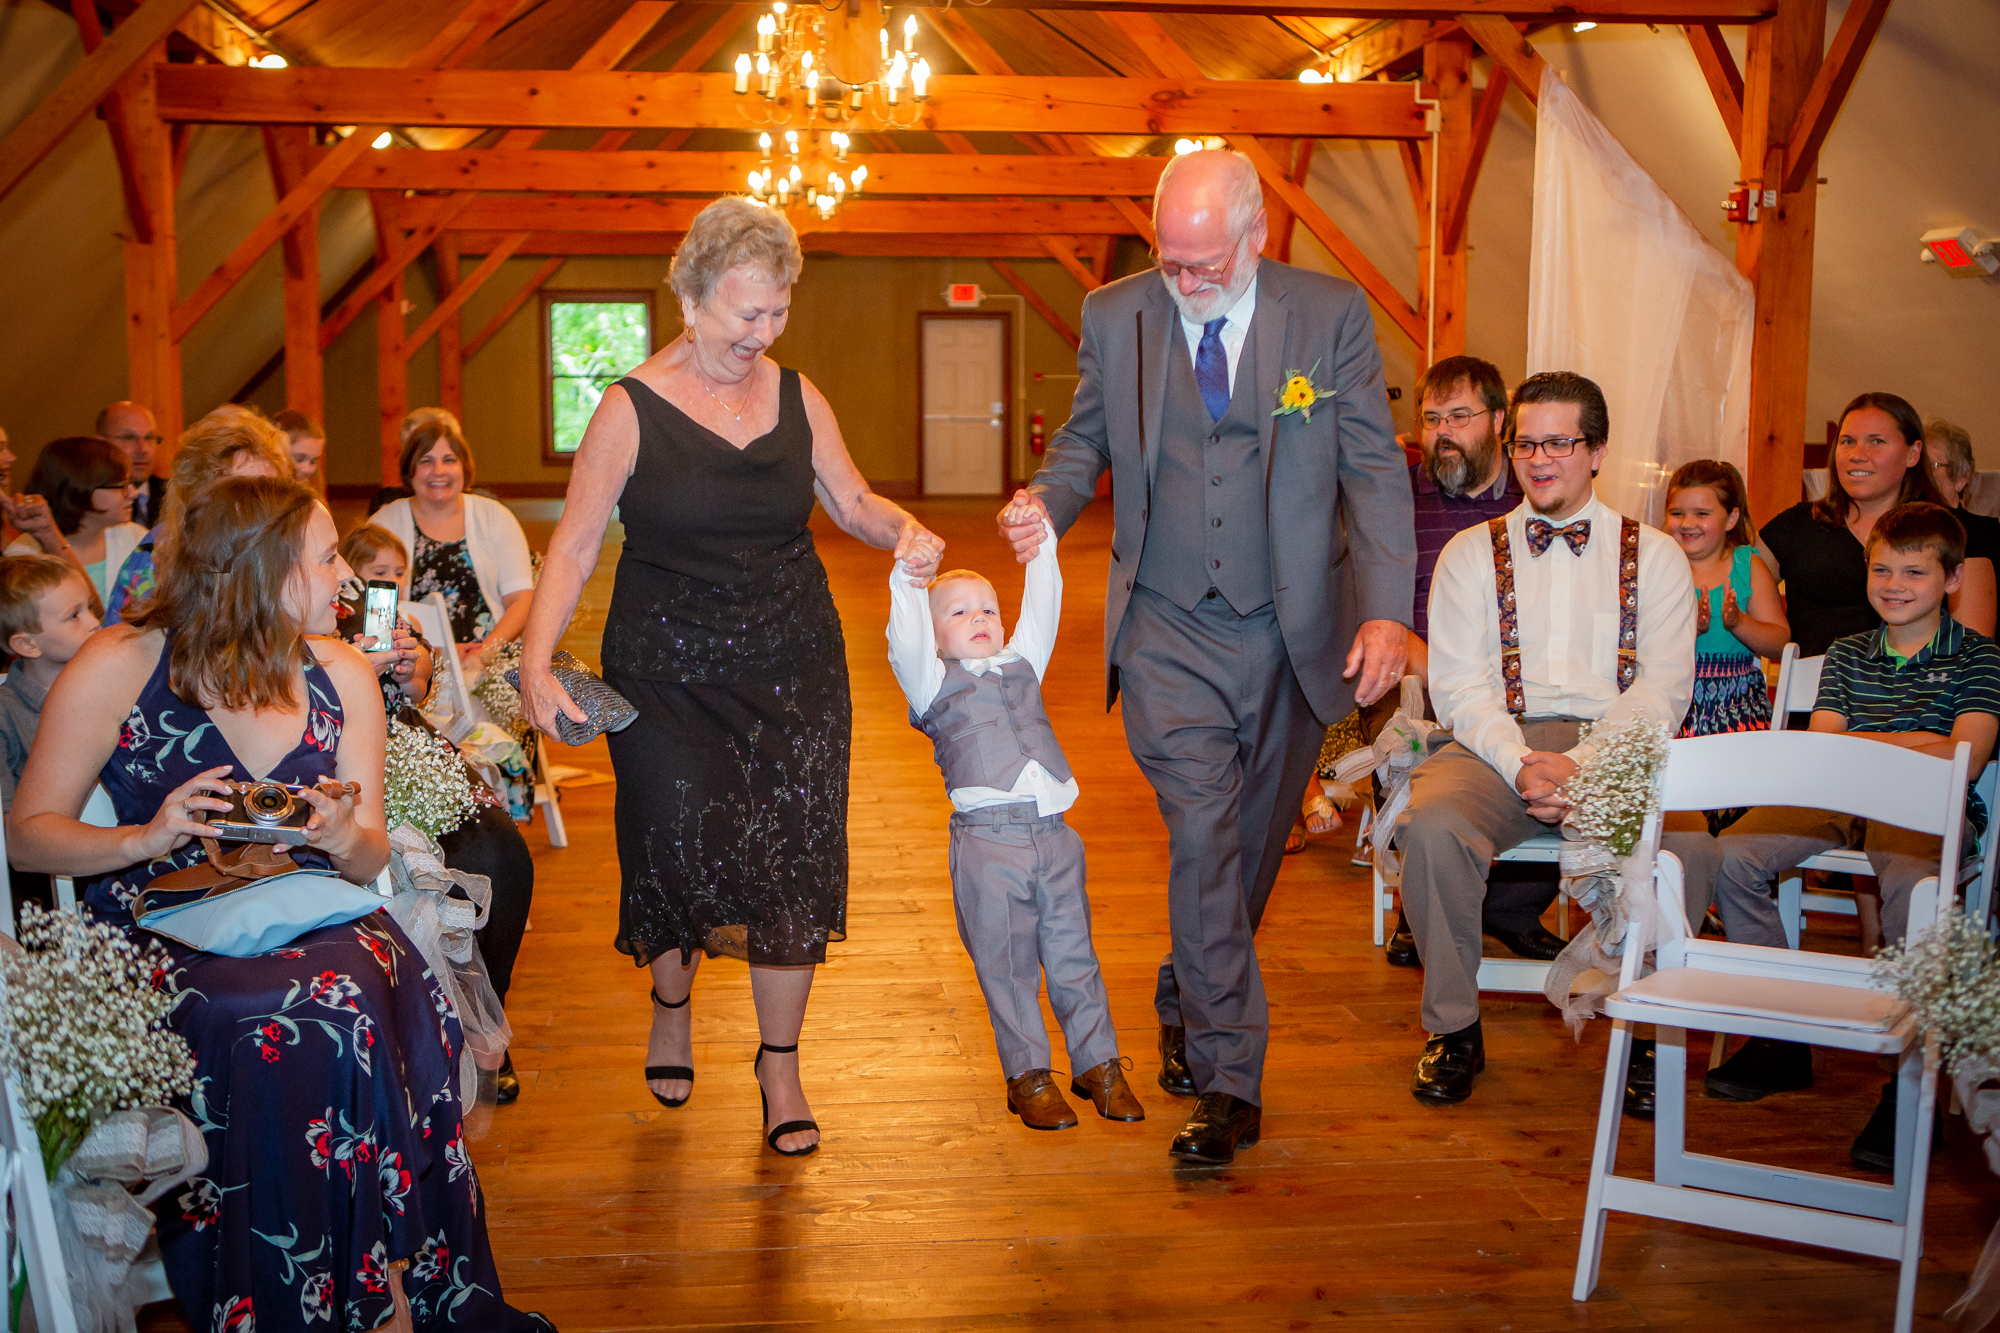 Wedding-Carriage-House-Oneonta-NY-0517.jpg